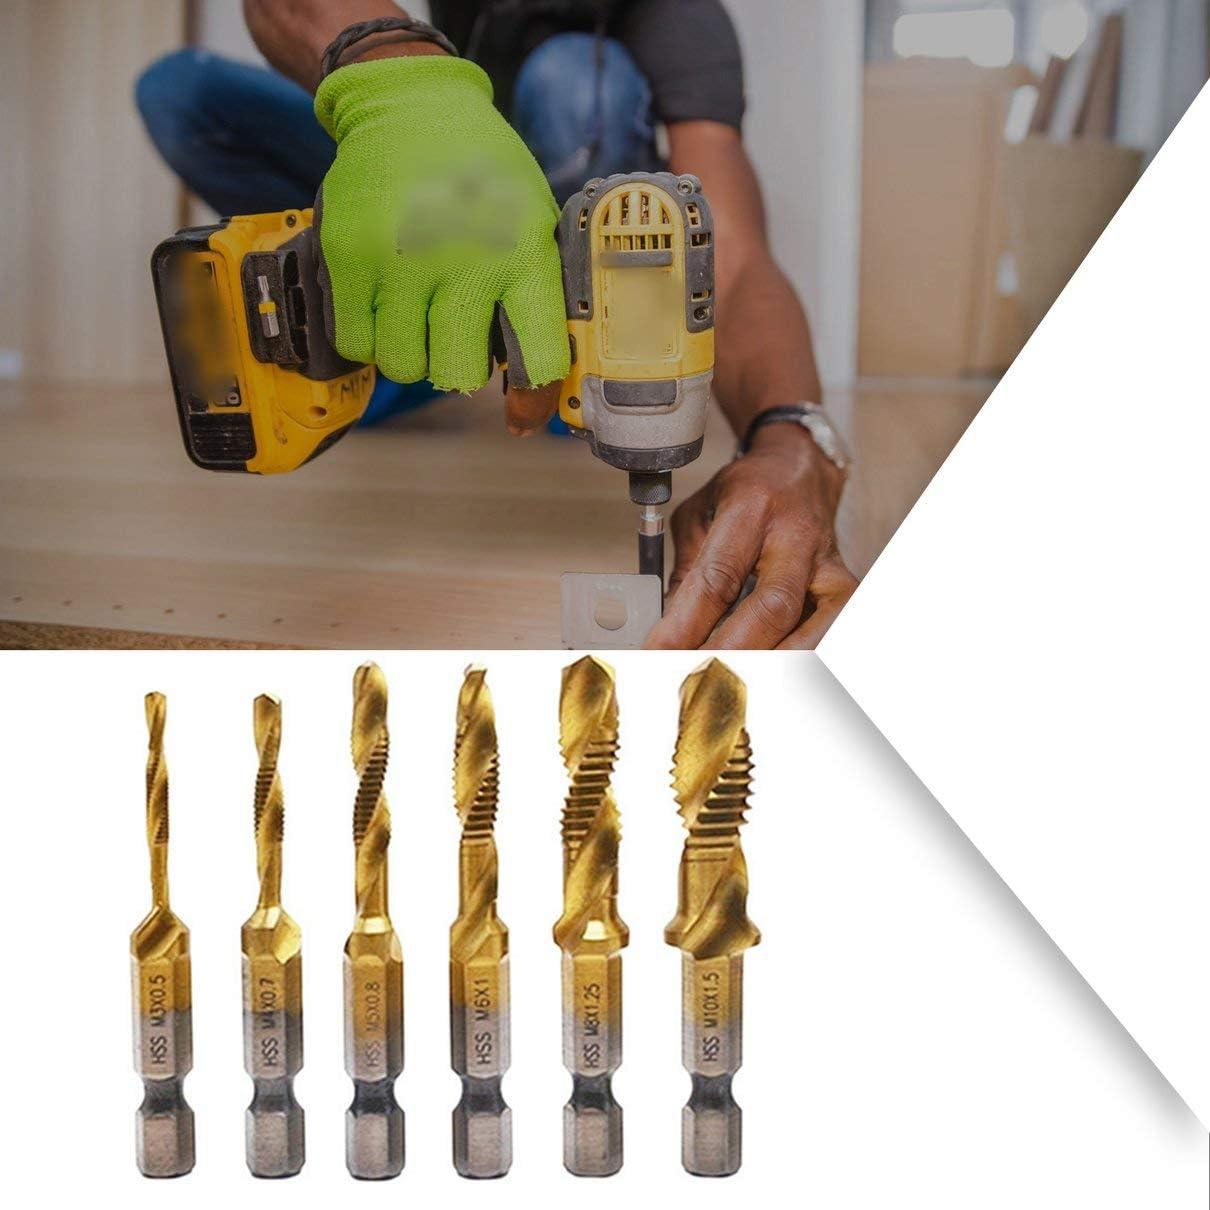 Kaczmarek 6pcs//Set Hand Tap Hex Shank Tapping Drill Bit High Speed Steel Multifunctional Integrated Tap,Metric Plug Drill Bits M3 M4 M5 M6 M8 M10 Hand Tools